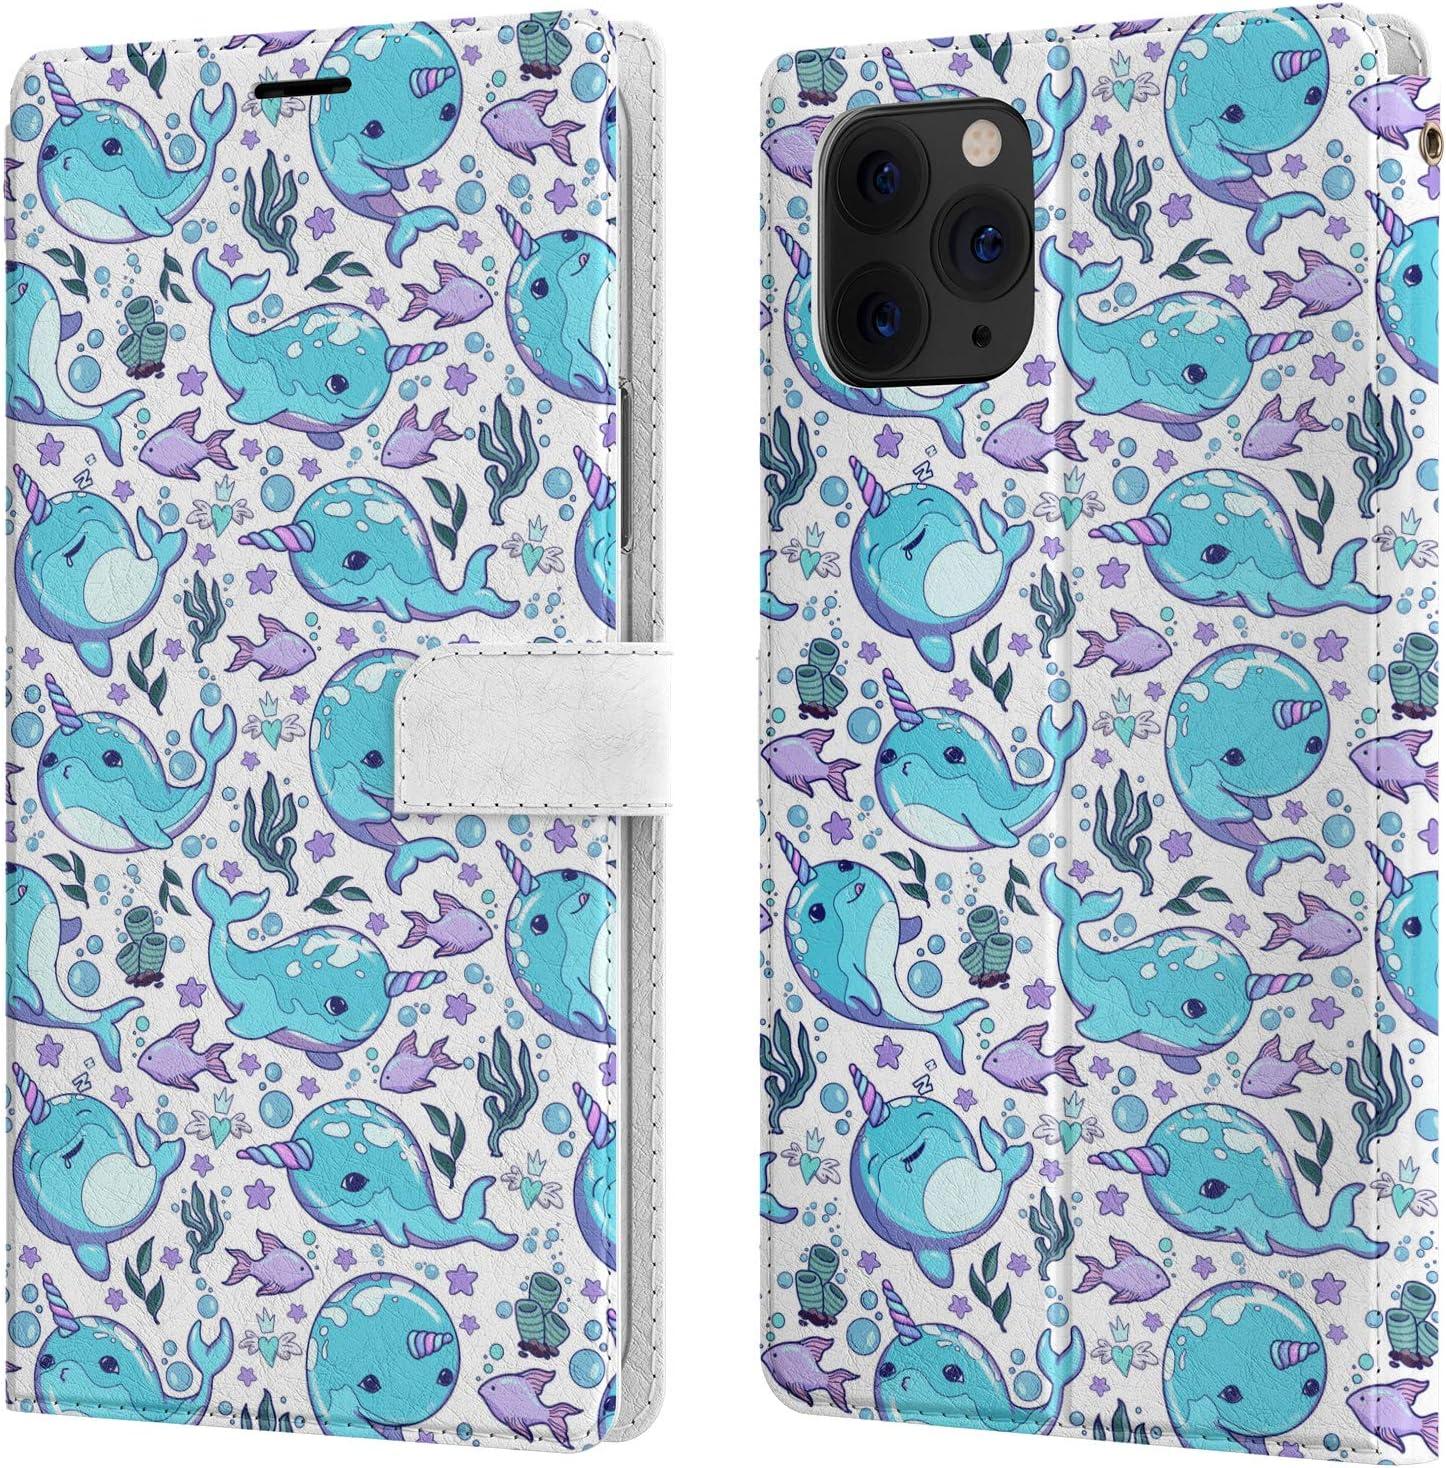 Amazon.com: Apple iPhone 8 Plus Flip Fabric Wallet Case